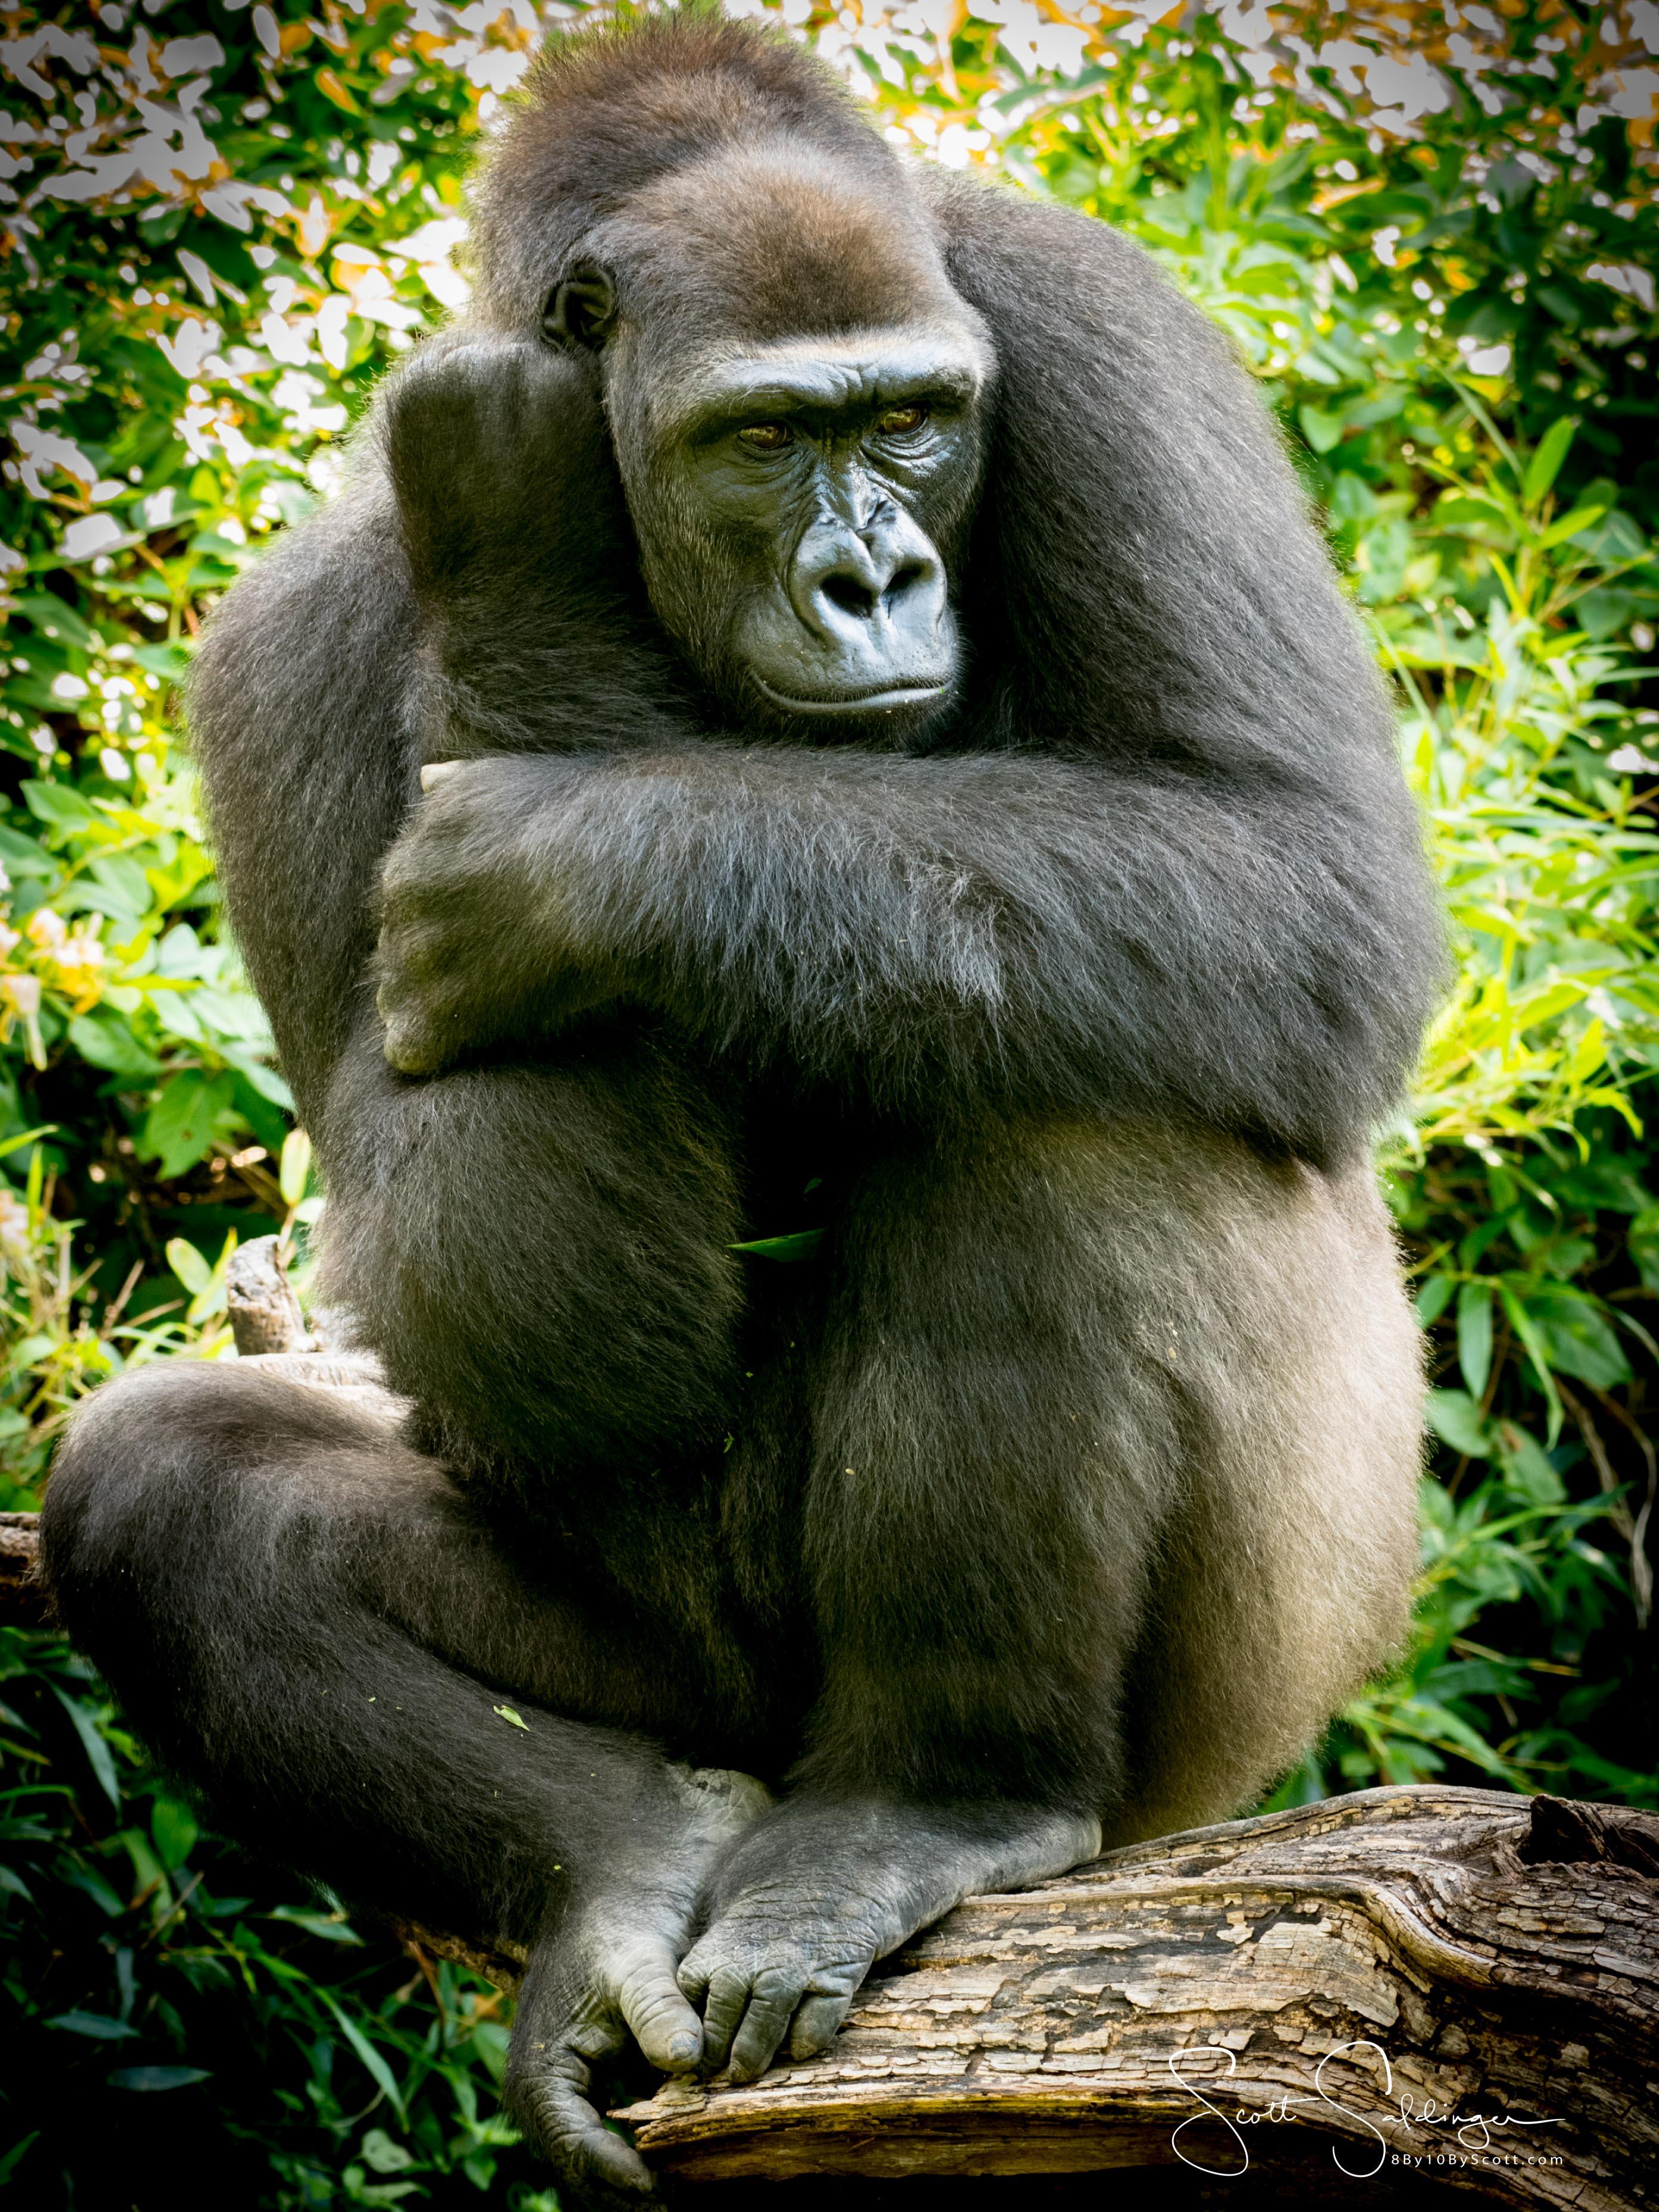 Apes-5694